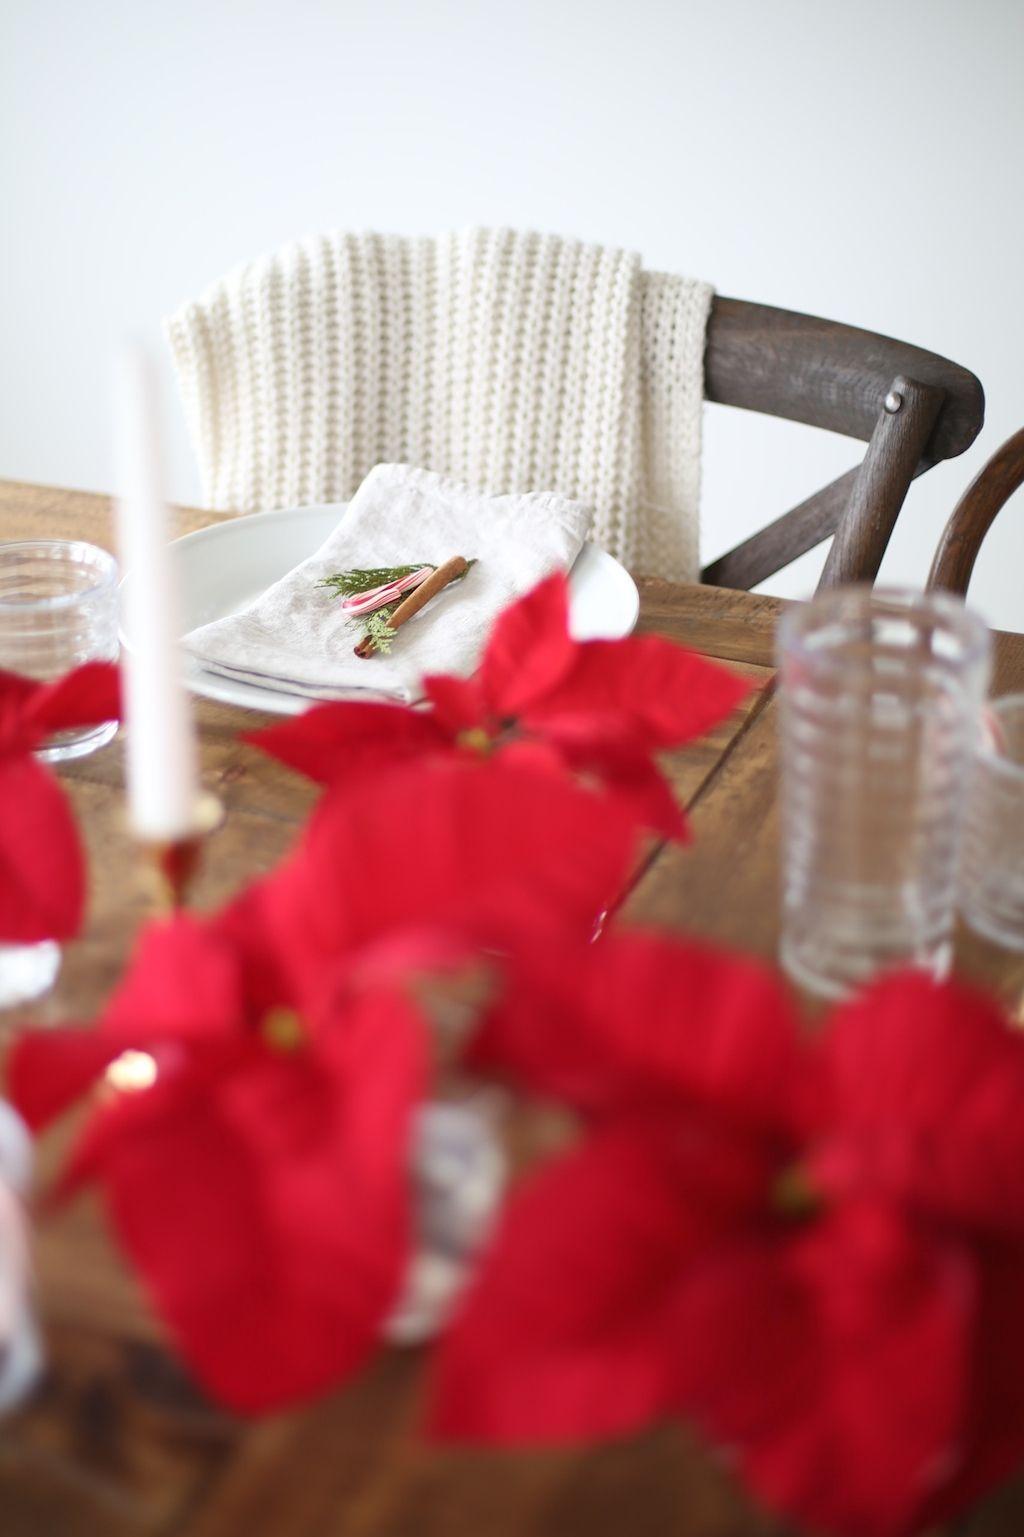 Southern Living Christmas entertaining & table setting from entertaining expert Julie Blanner